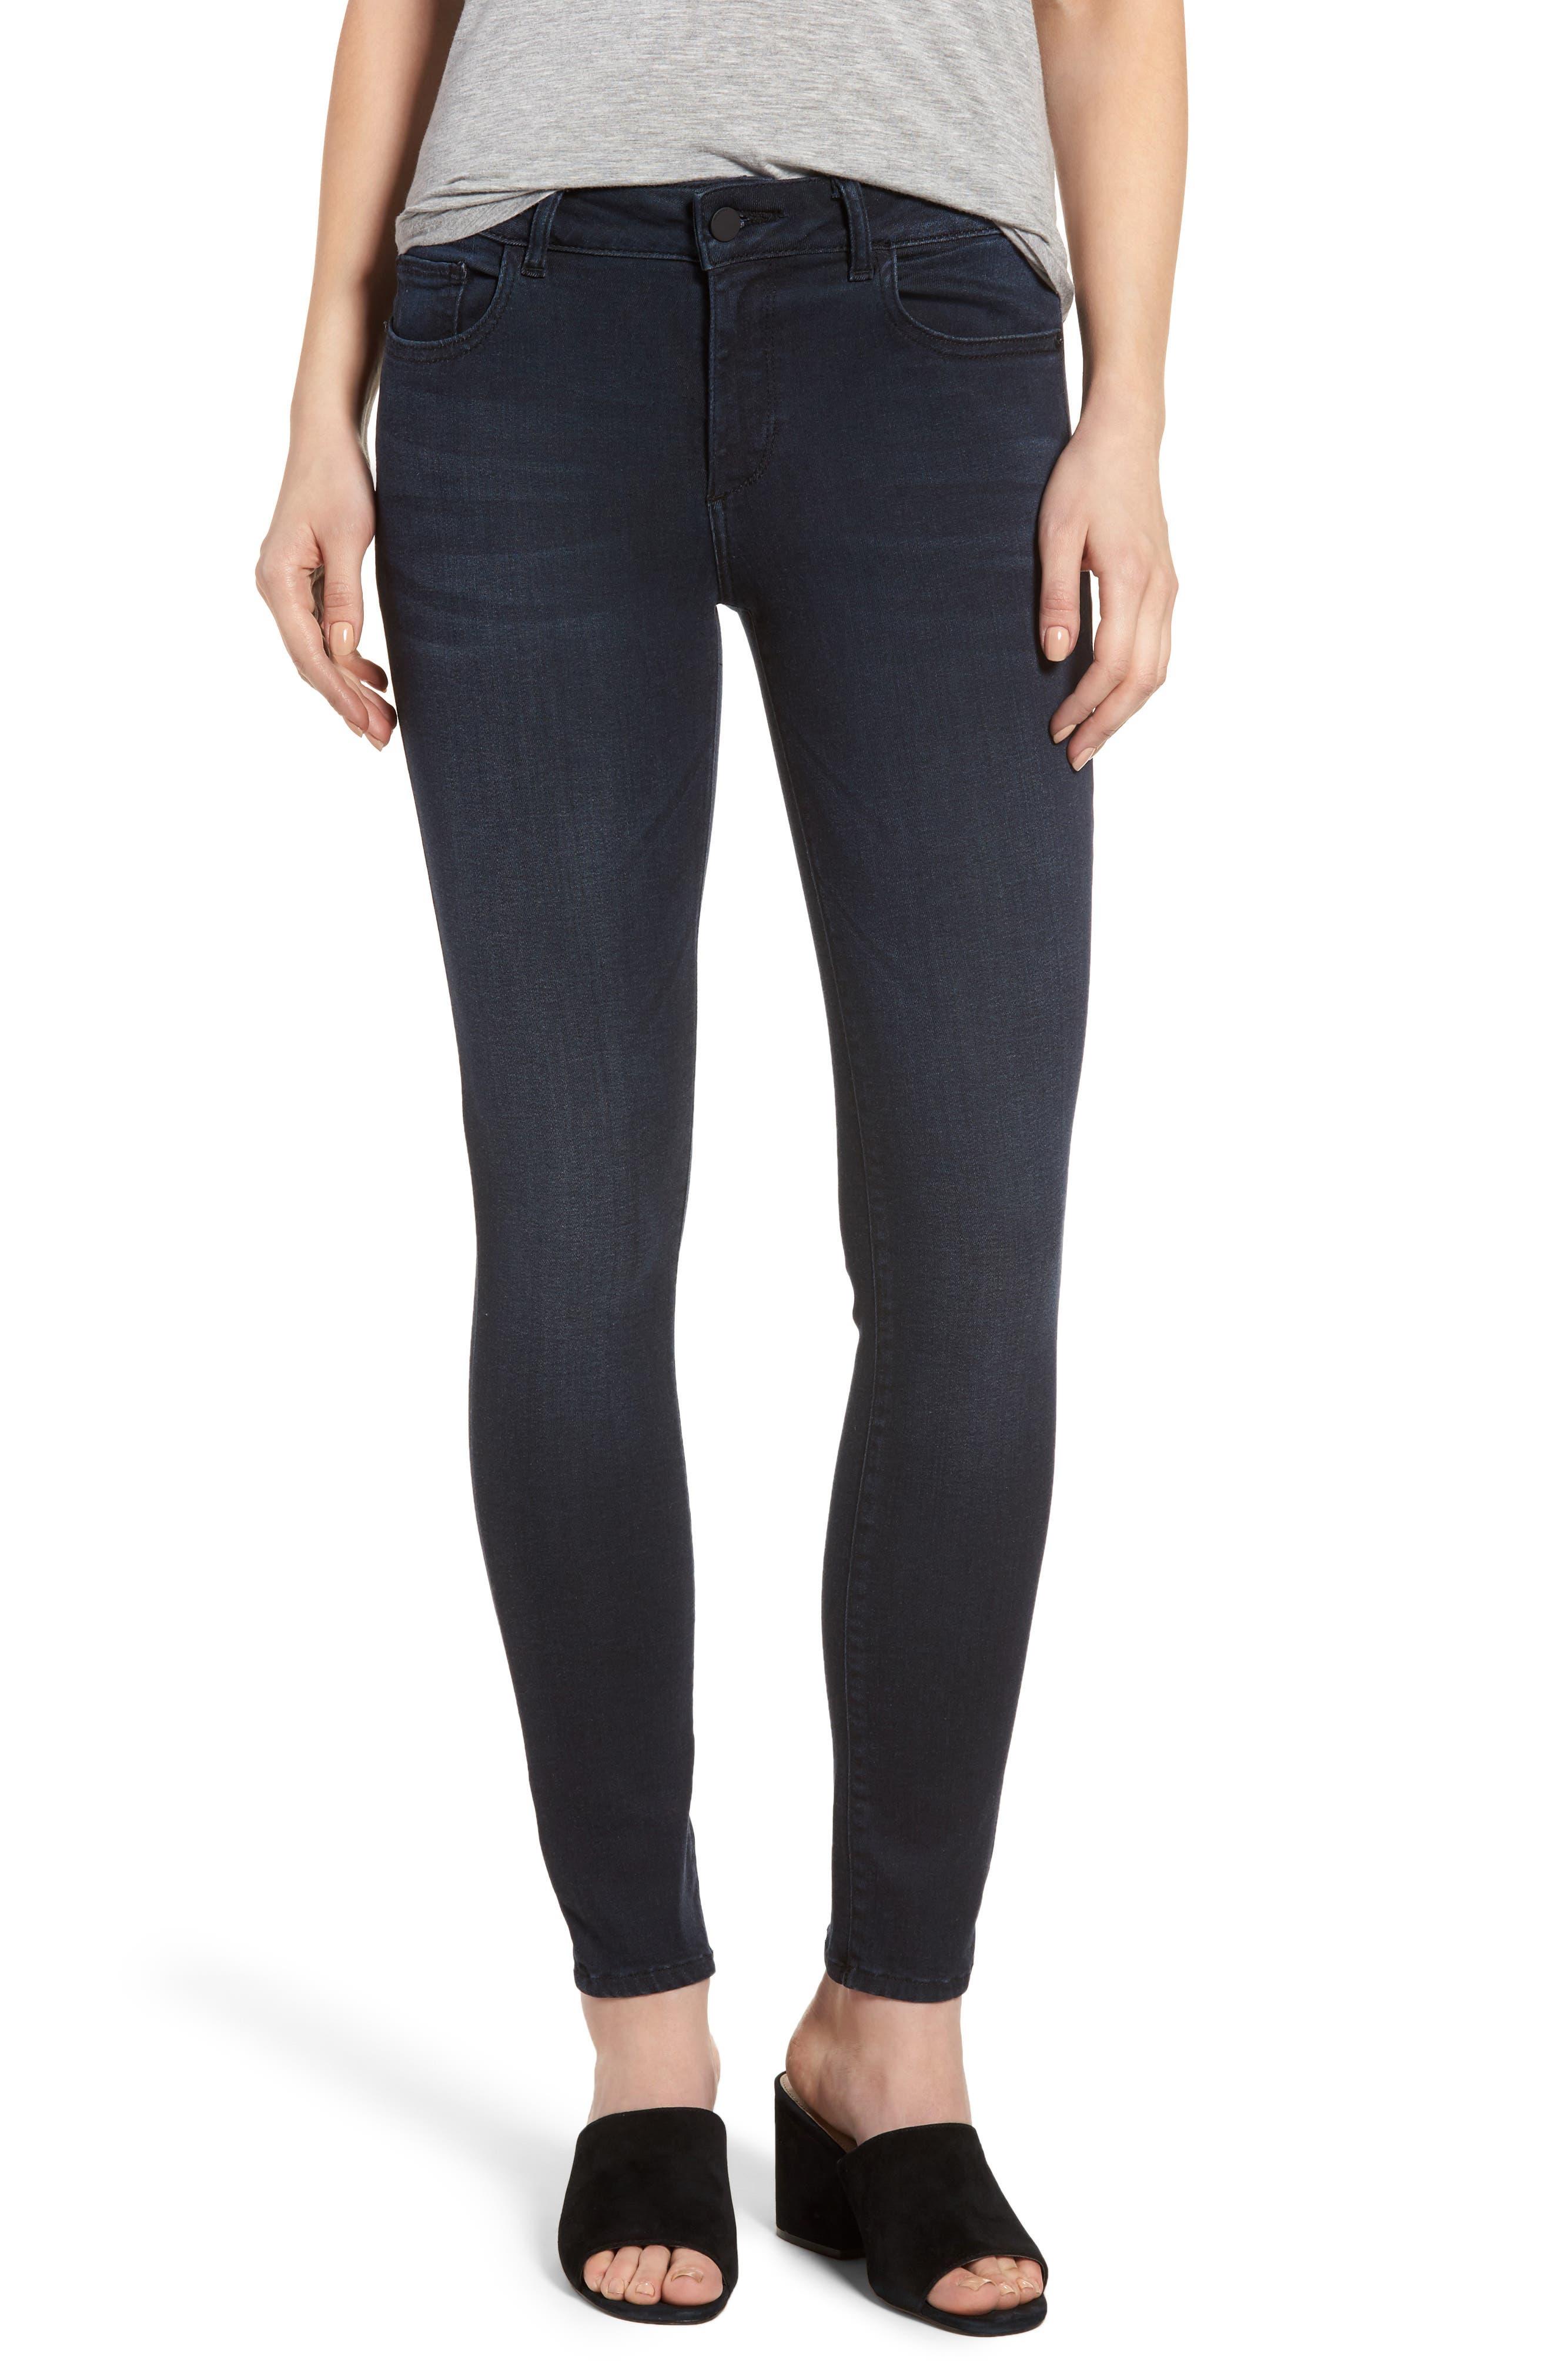 DL1961 Emma Power Legging Skinny Jeans (Macon)